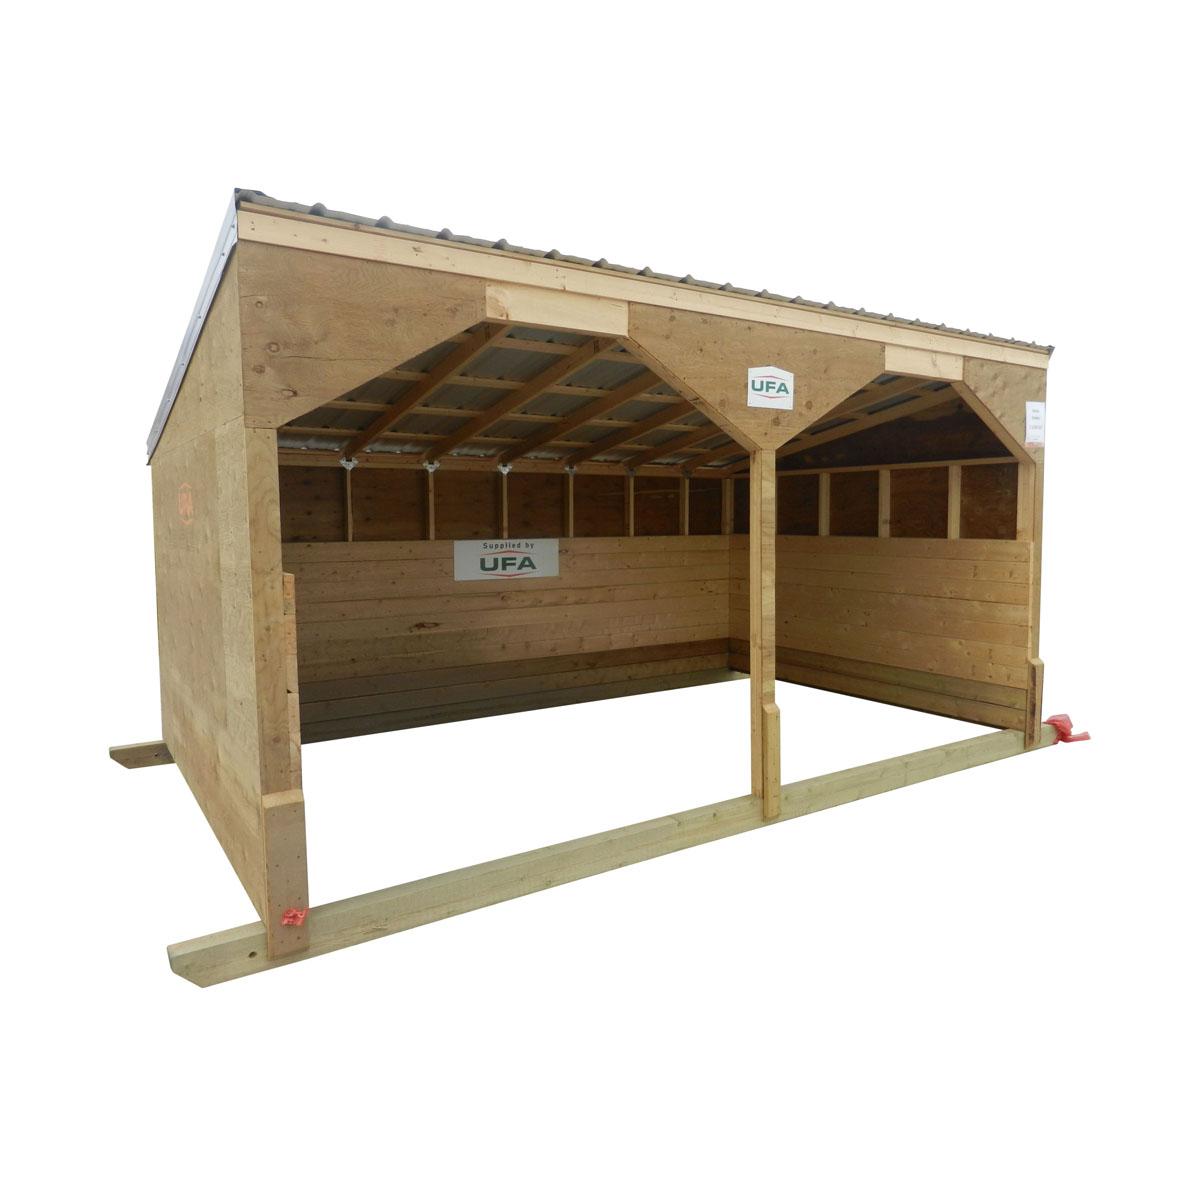 10'x16' Cattle Shelter (8' Front 6' Back)